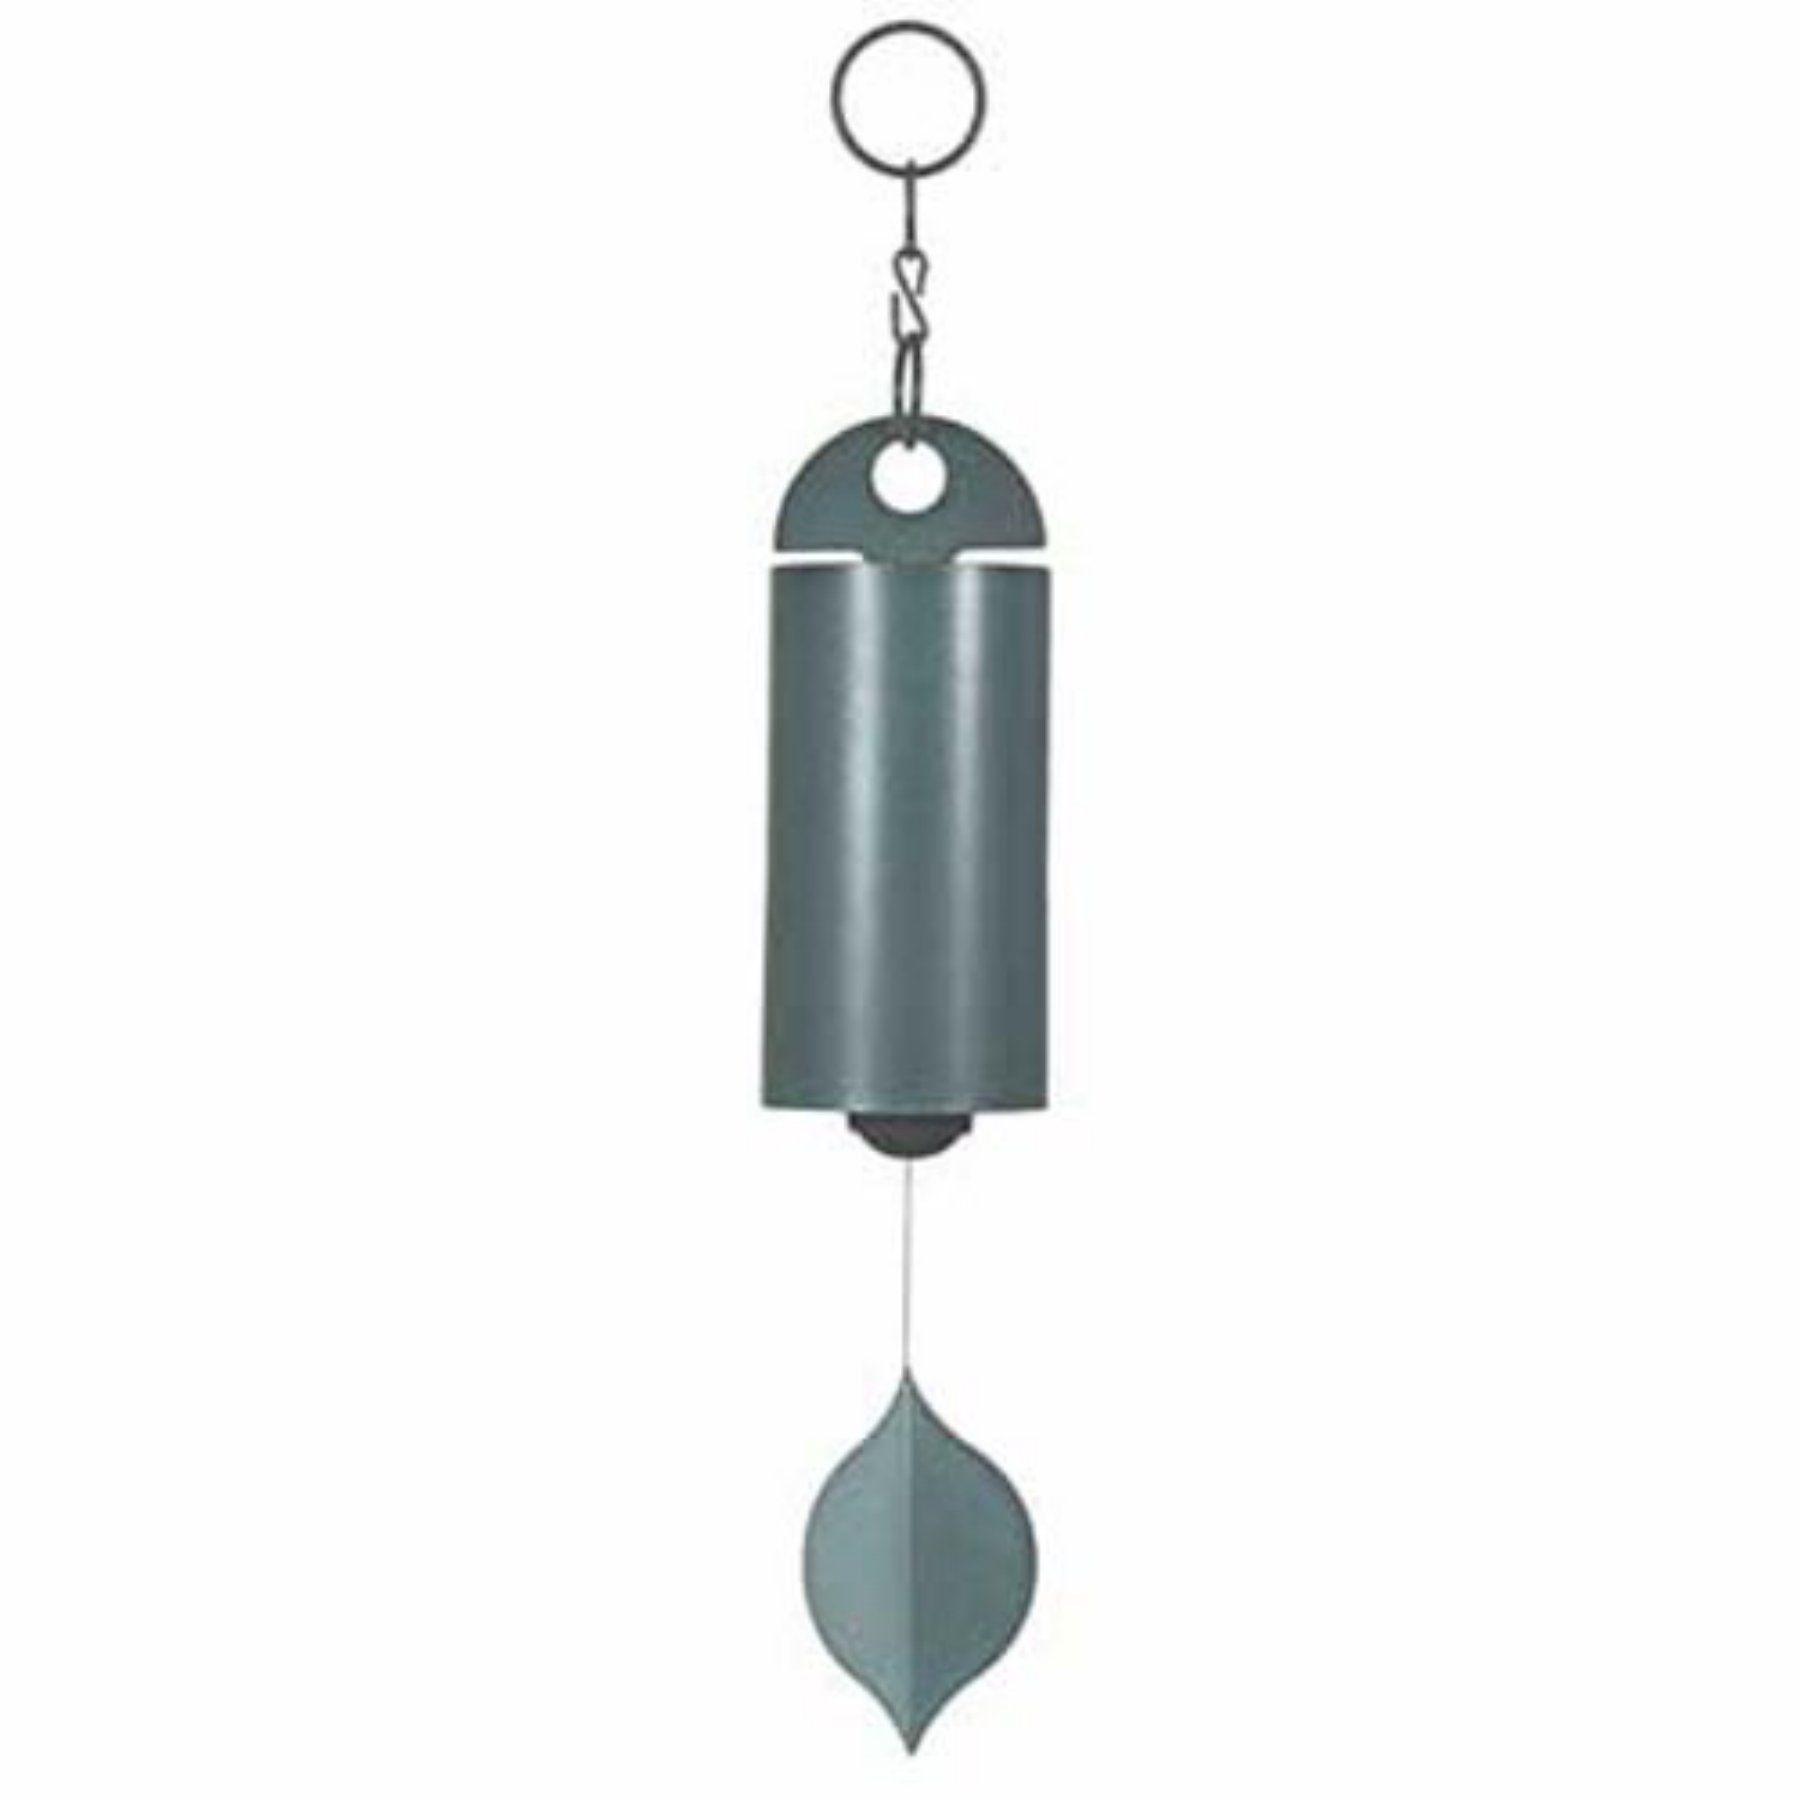 Woodstock Chimes Large Garden Bells